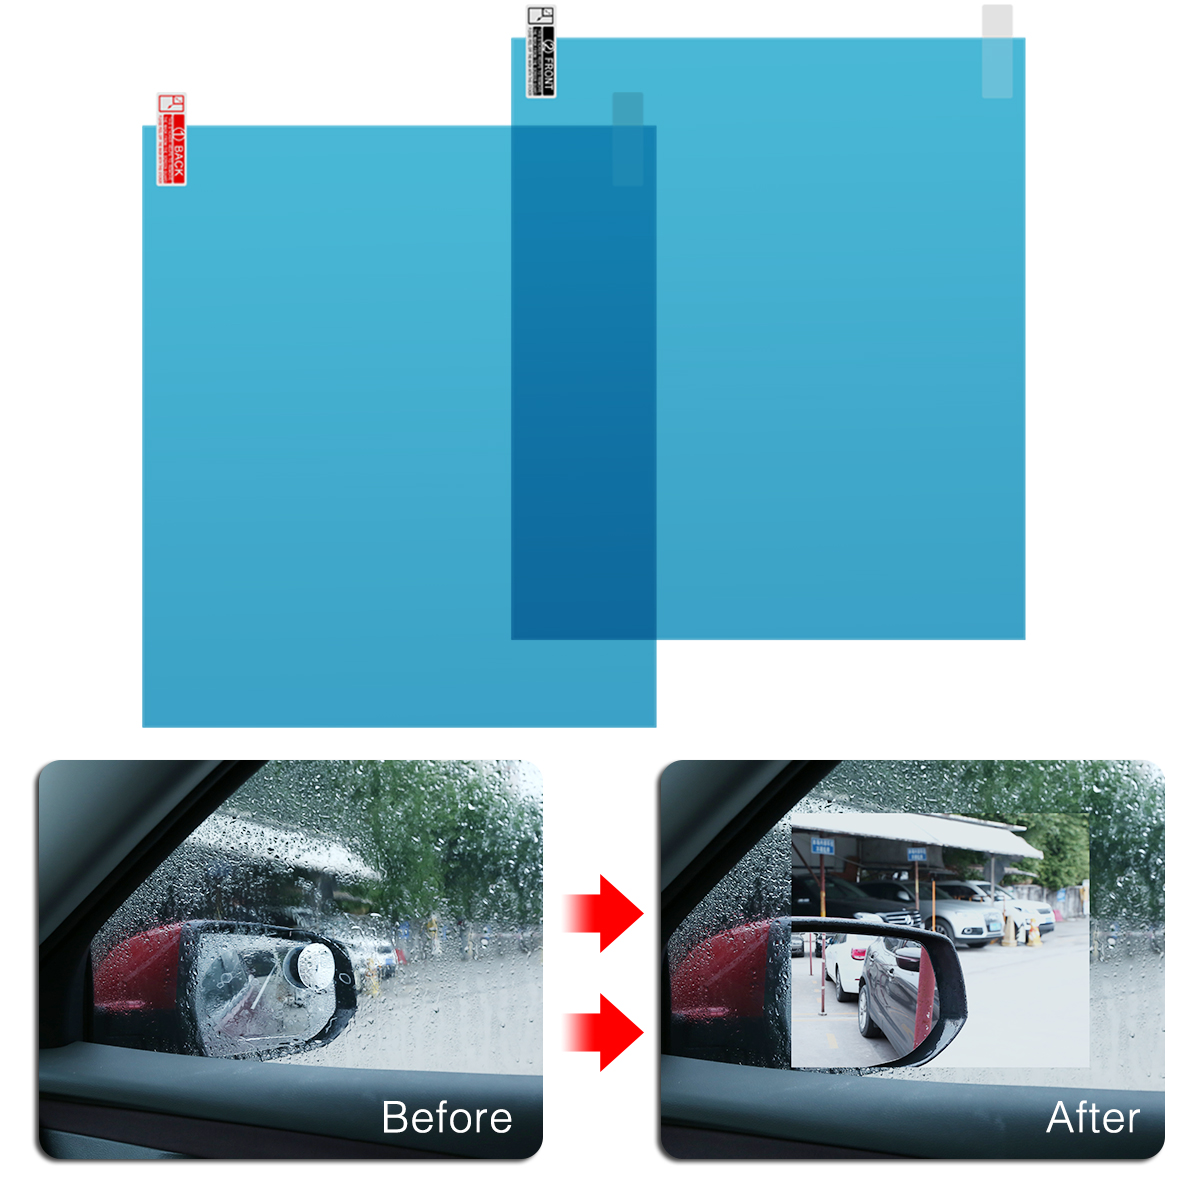 Универсальная 2 шт. Автомобильная Анти-туман, анти-туман, непромокаемая оконная защитная пленка, зеркало заднего вида, непромокаемая пленка 175*200 мм